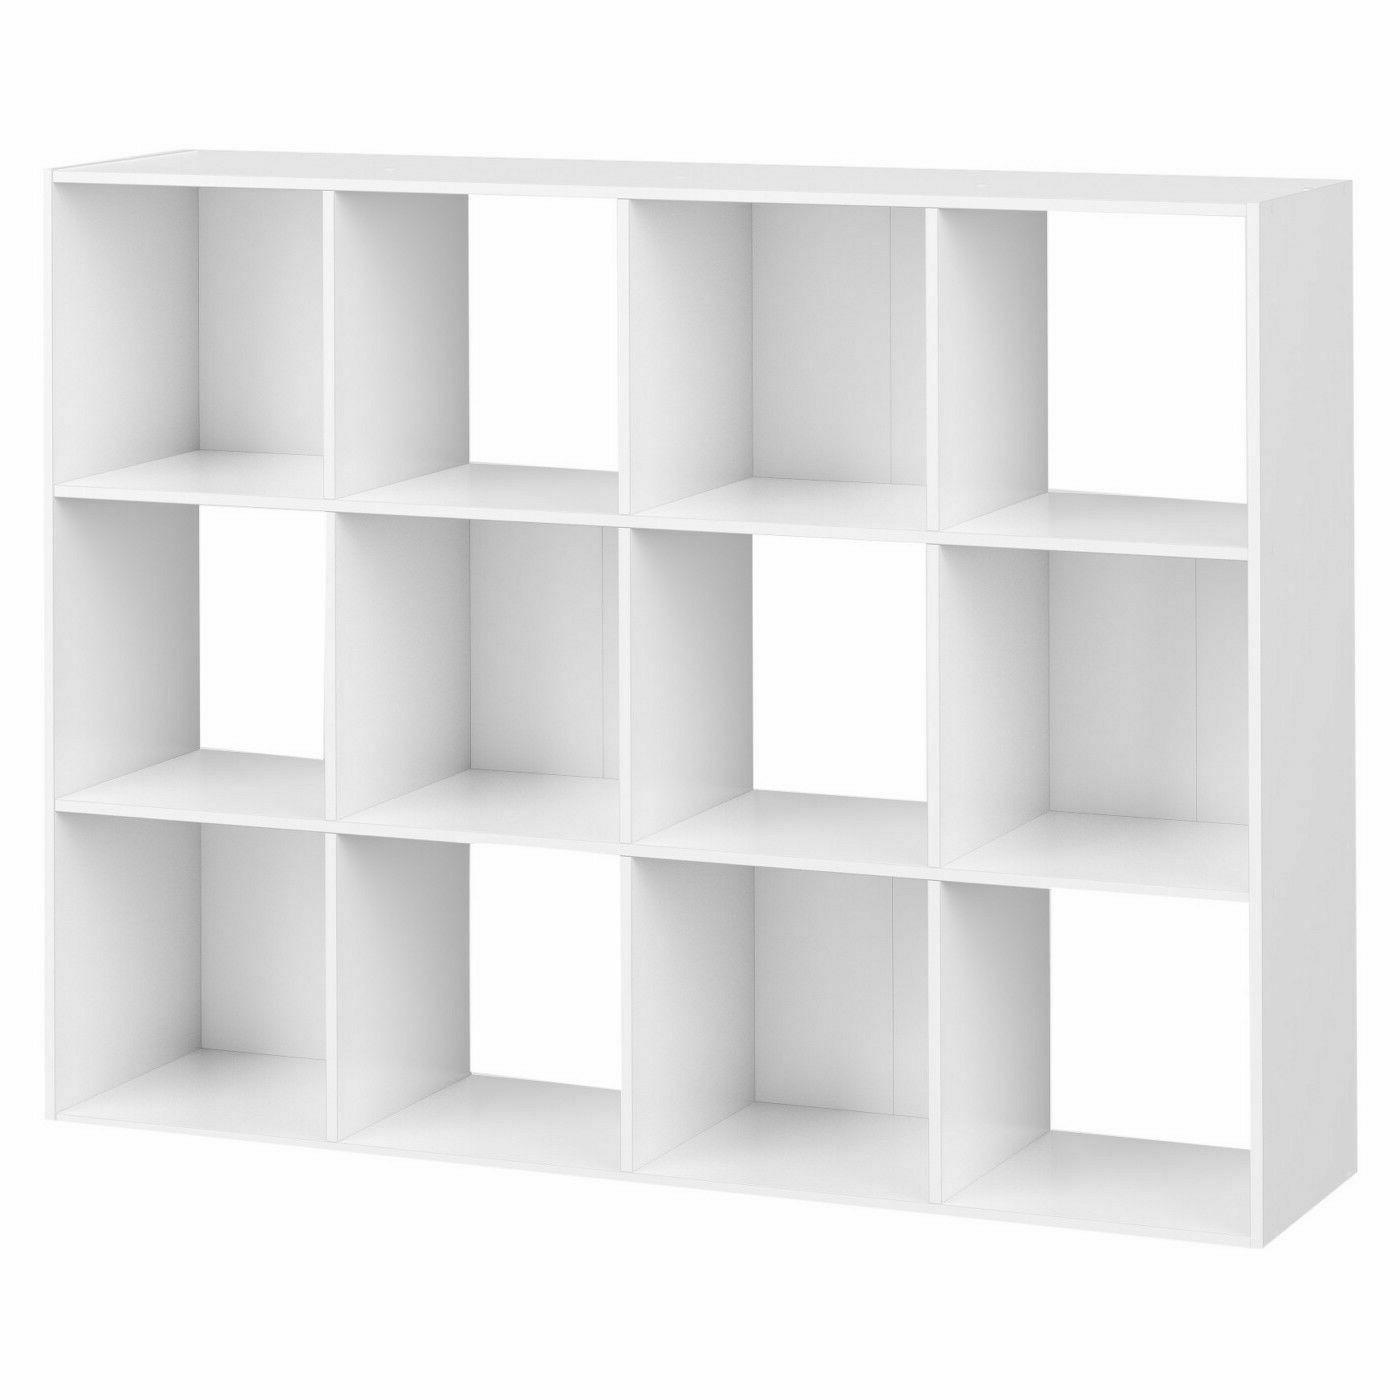 12-Cube Organizer Closet Shelf Box